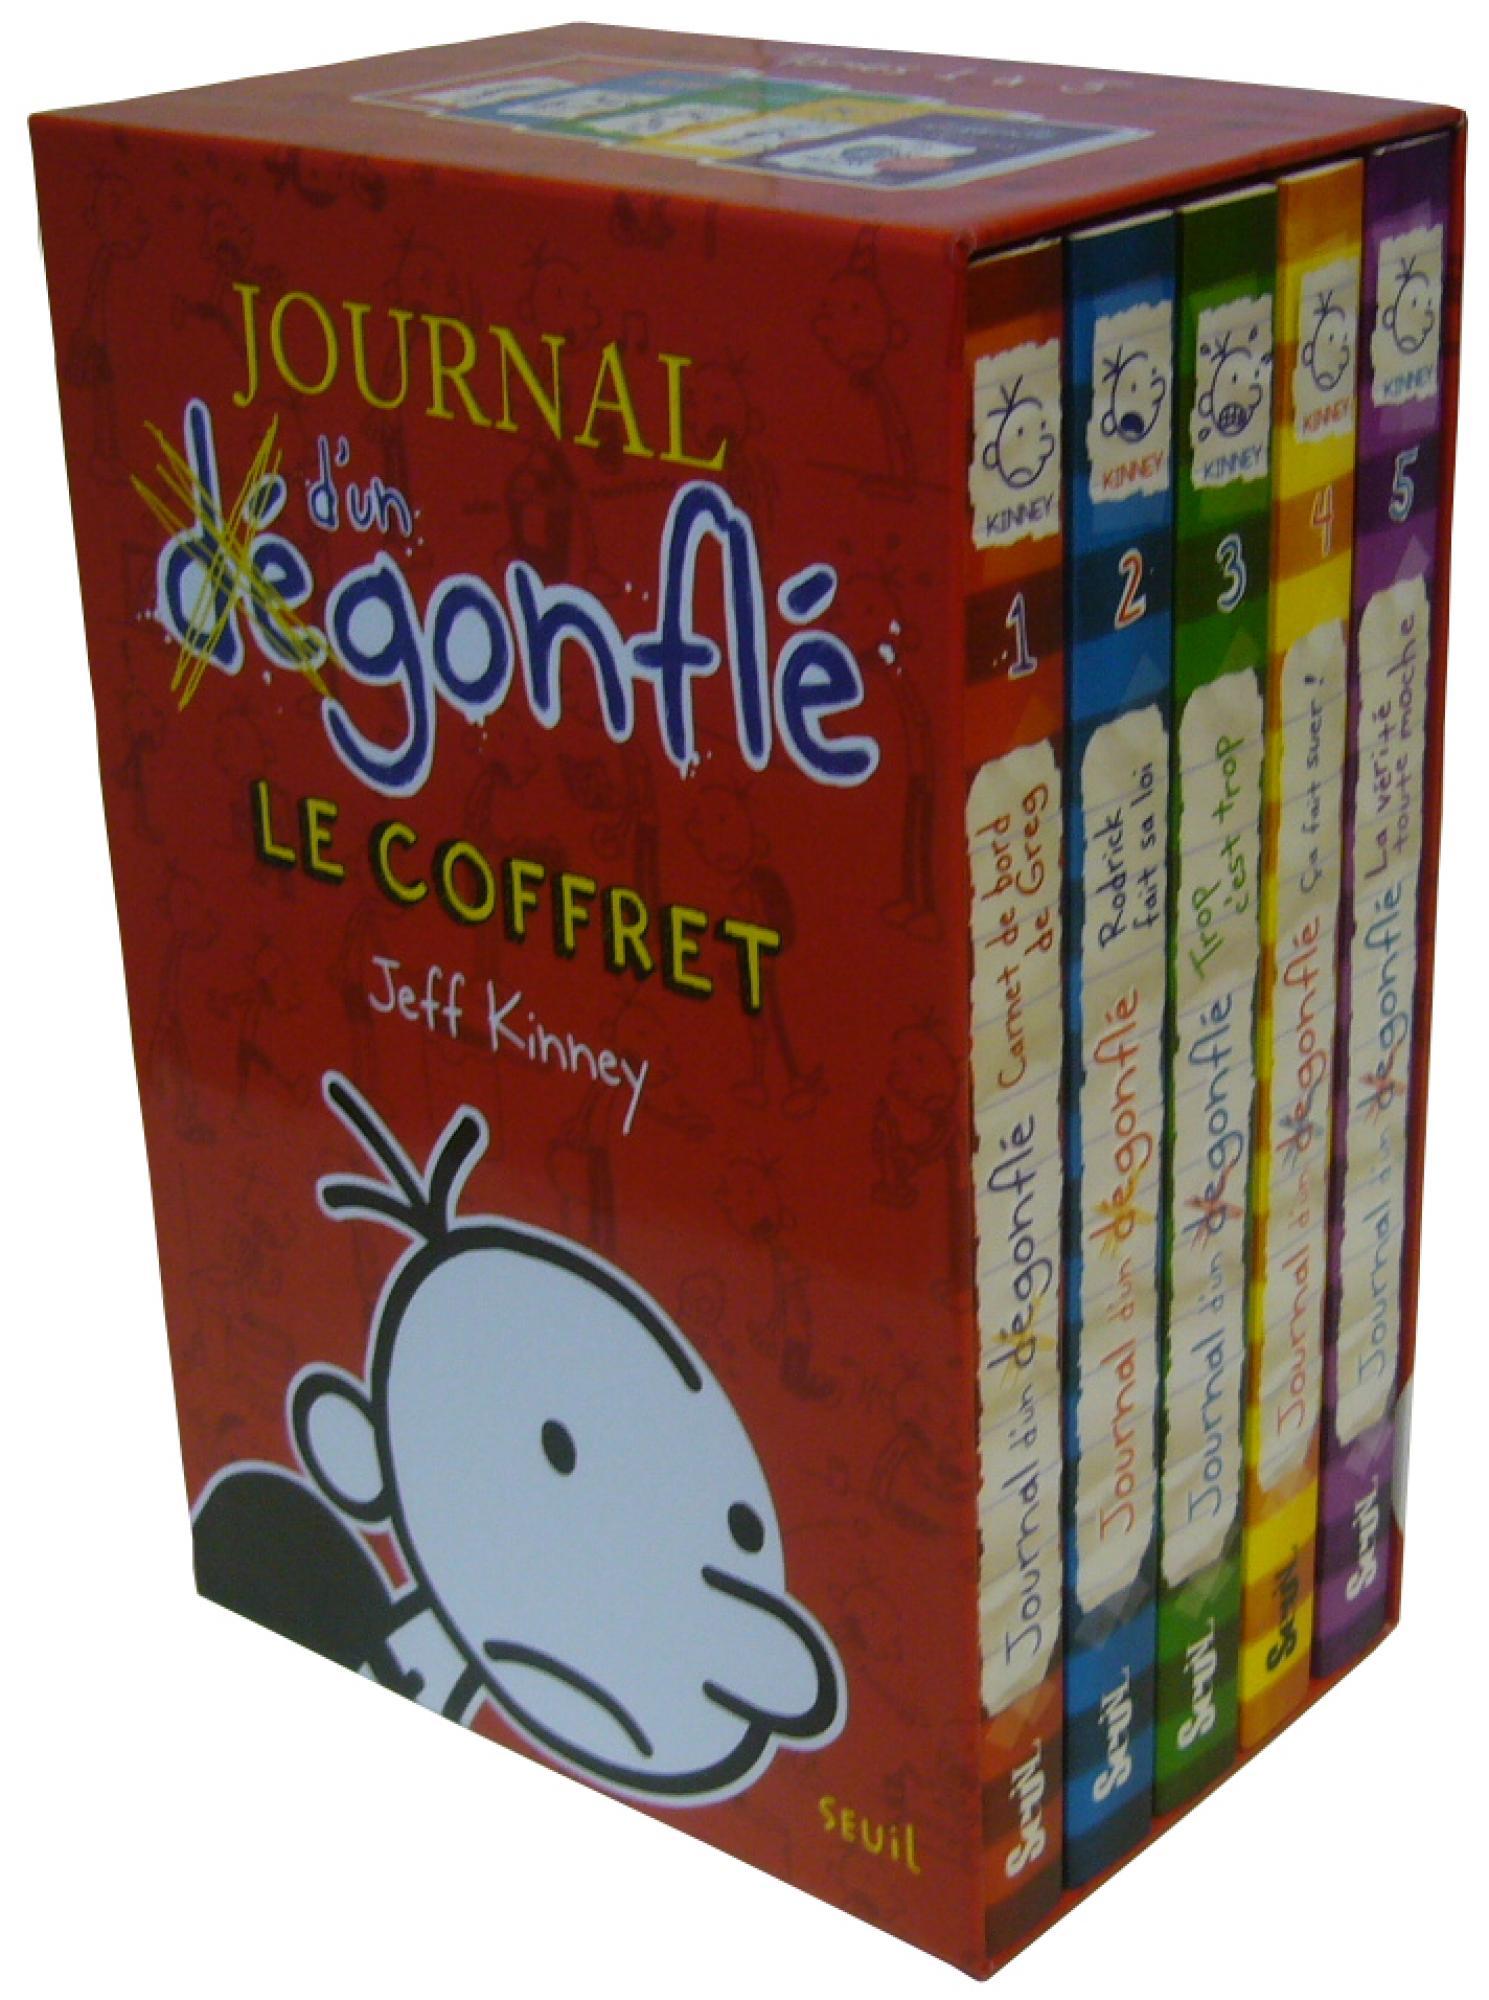 Carnet de bord de greg heffley jeff kinney jeunesse seuil editions seuil - Le journal d eyragues ...